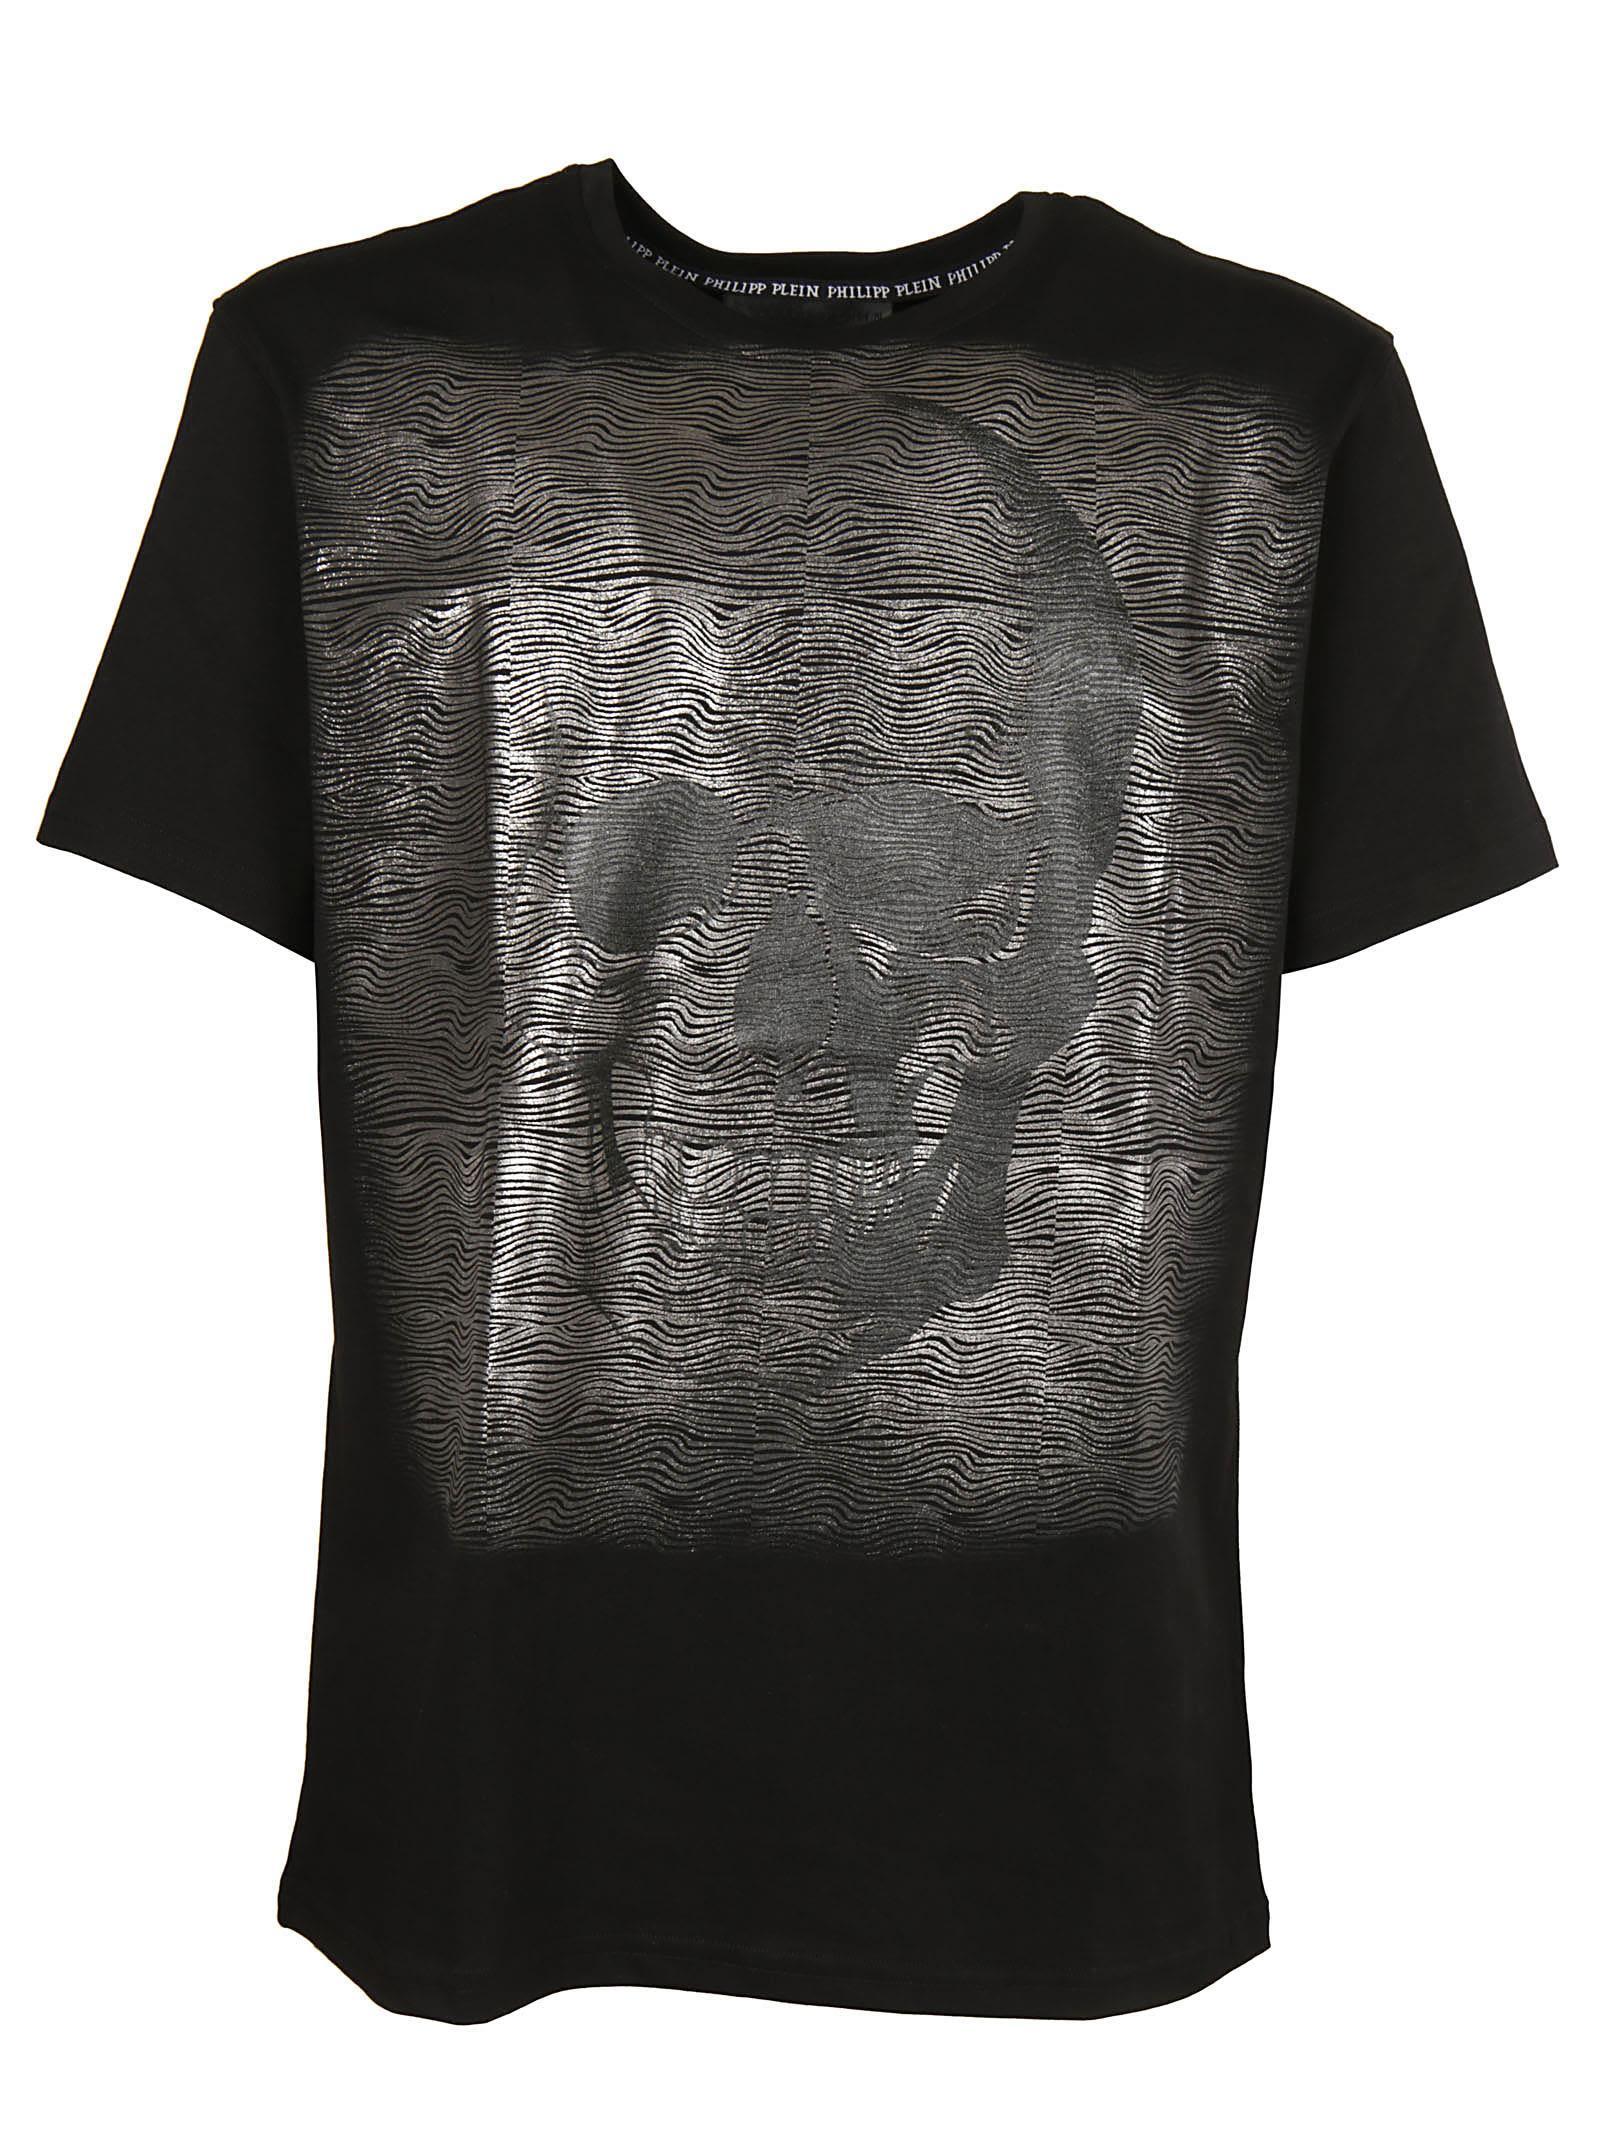 Philipp Plein Metallic Skull Print T-shirt